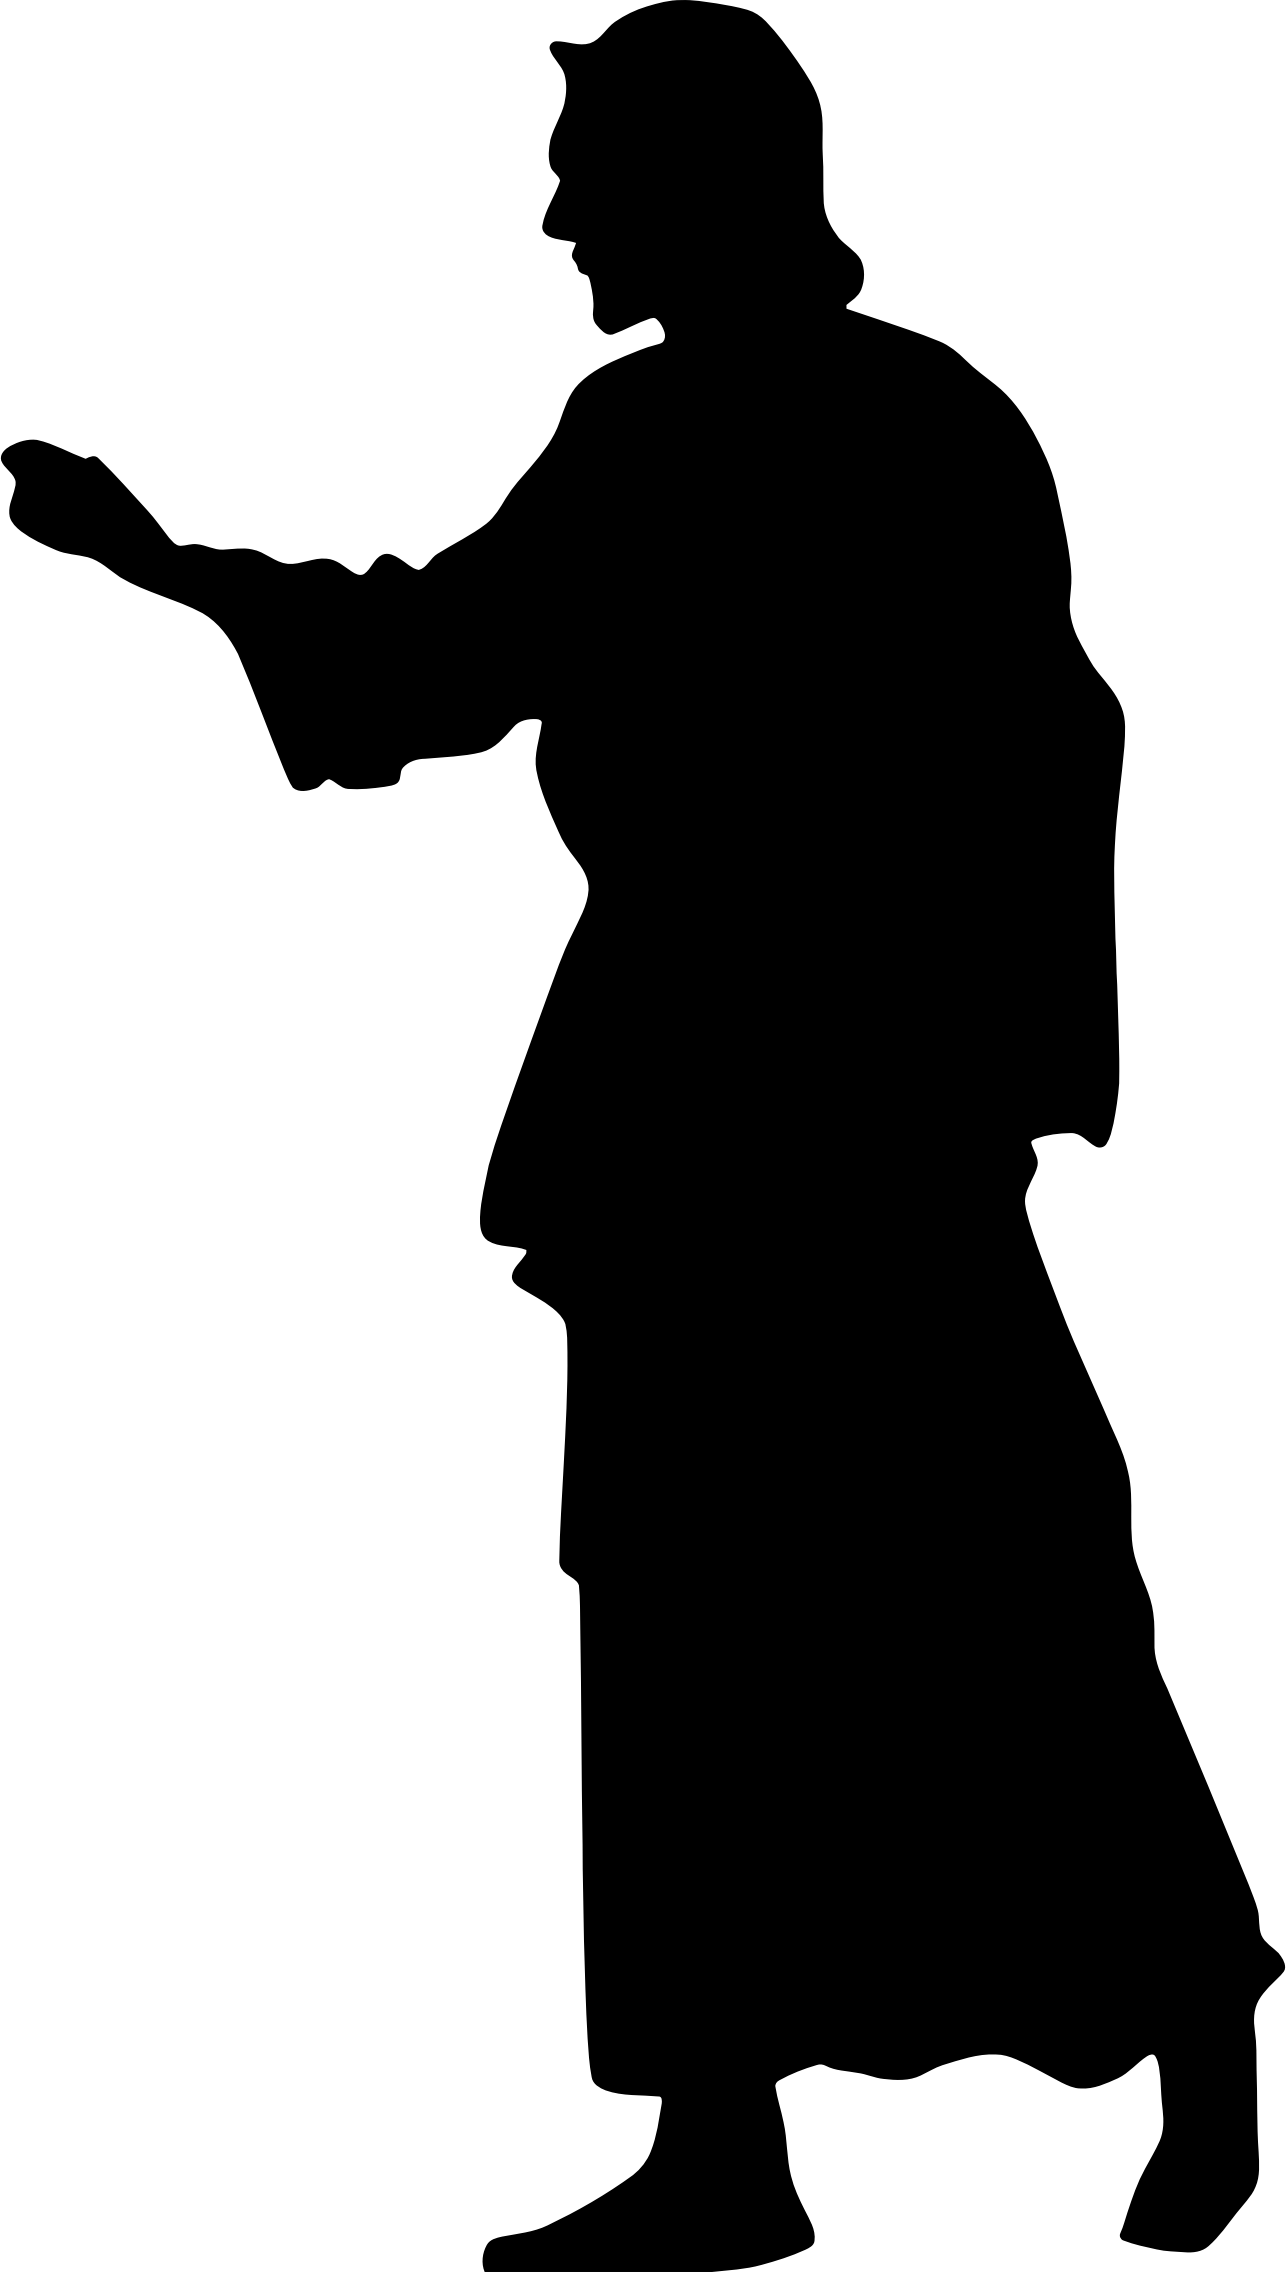 Silhouette Crucifixion of Jesus Clip art.